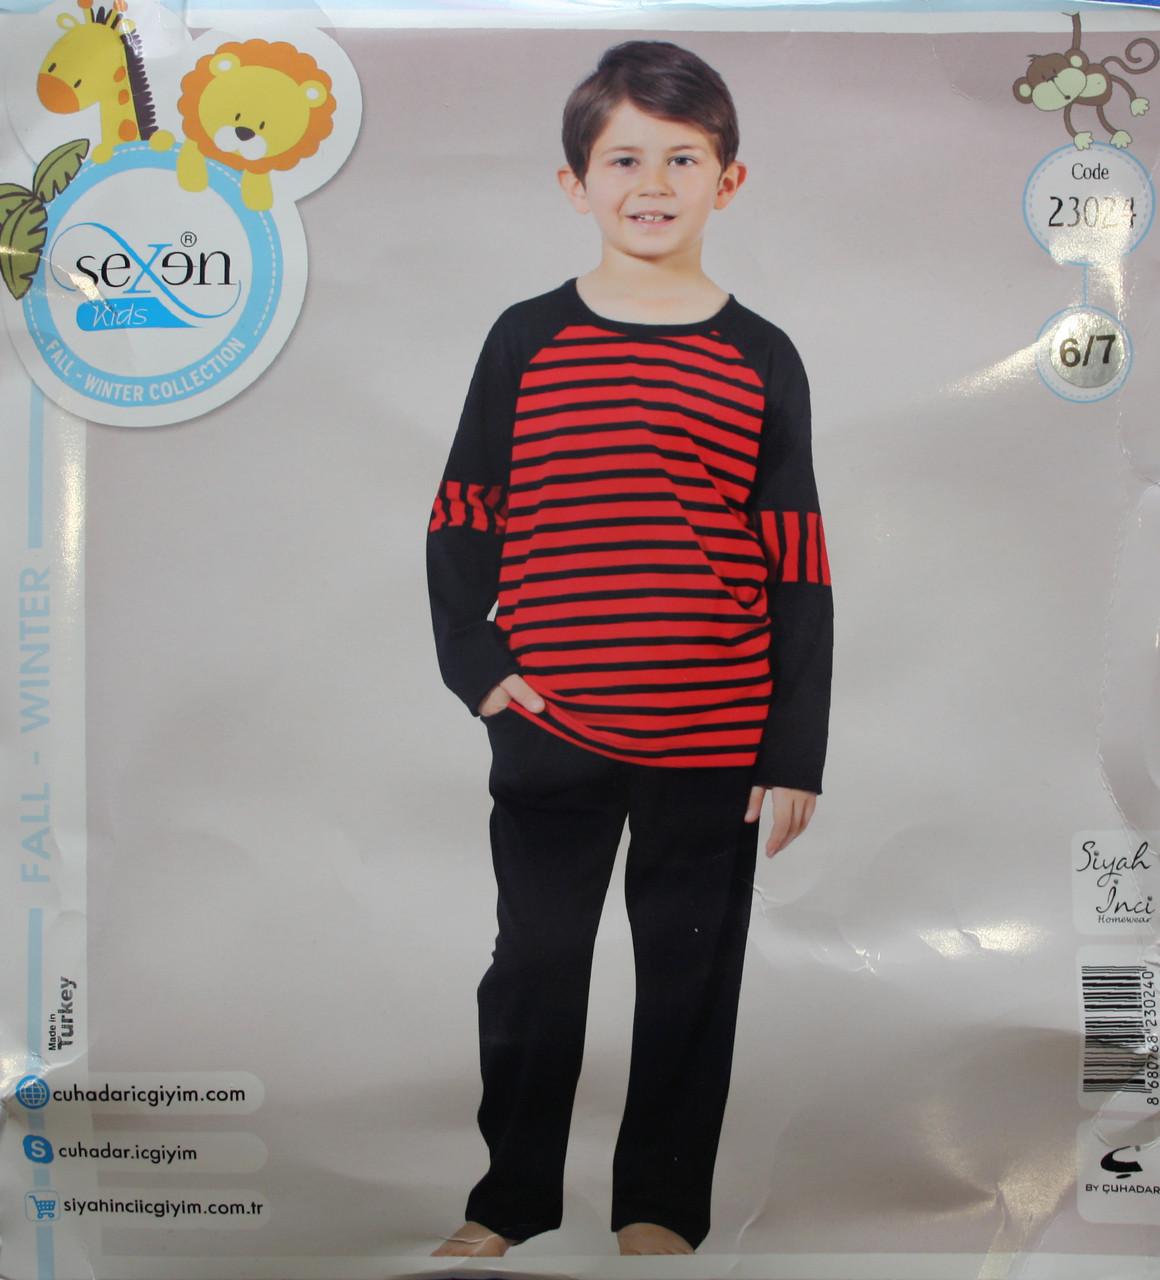 Дитяча піжама для хлопчика SEXEN 23024